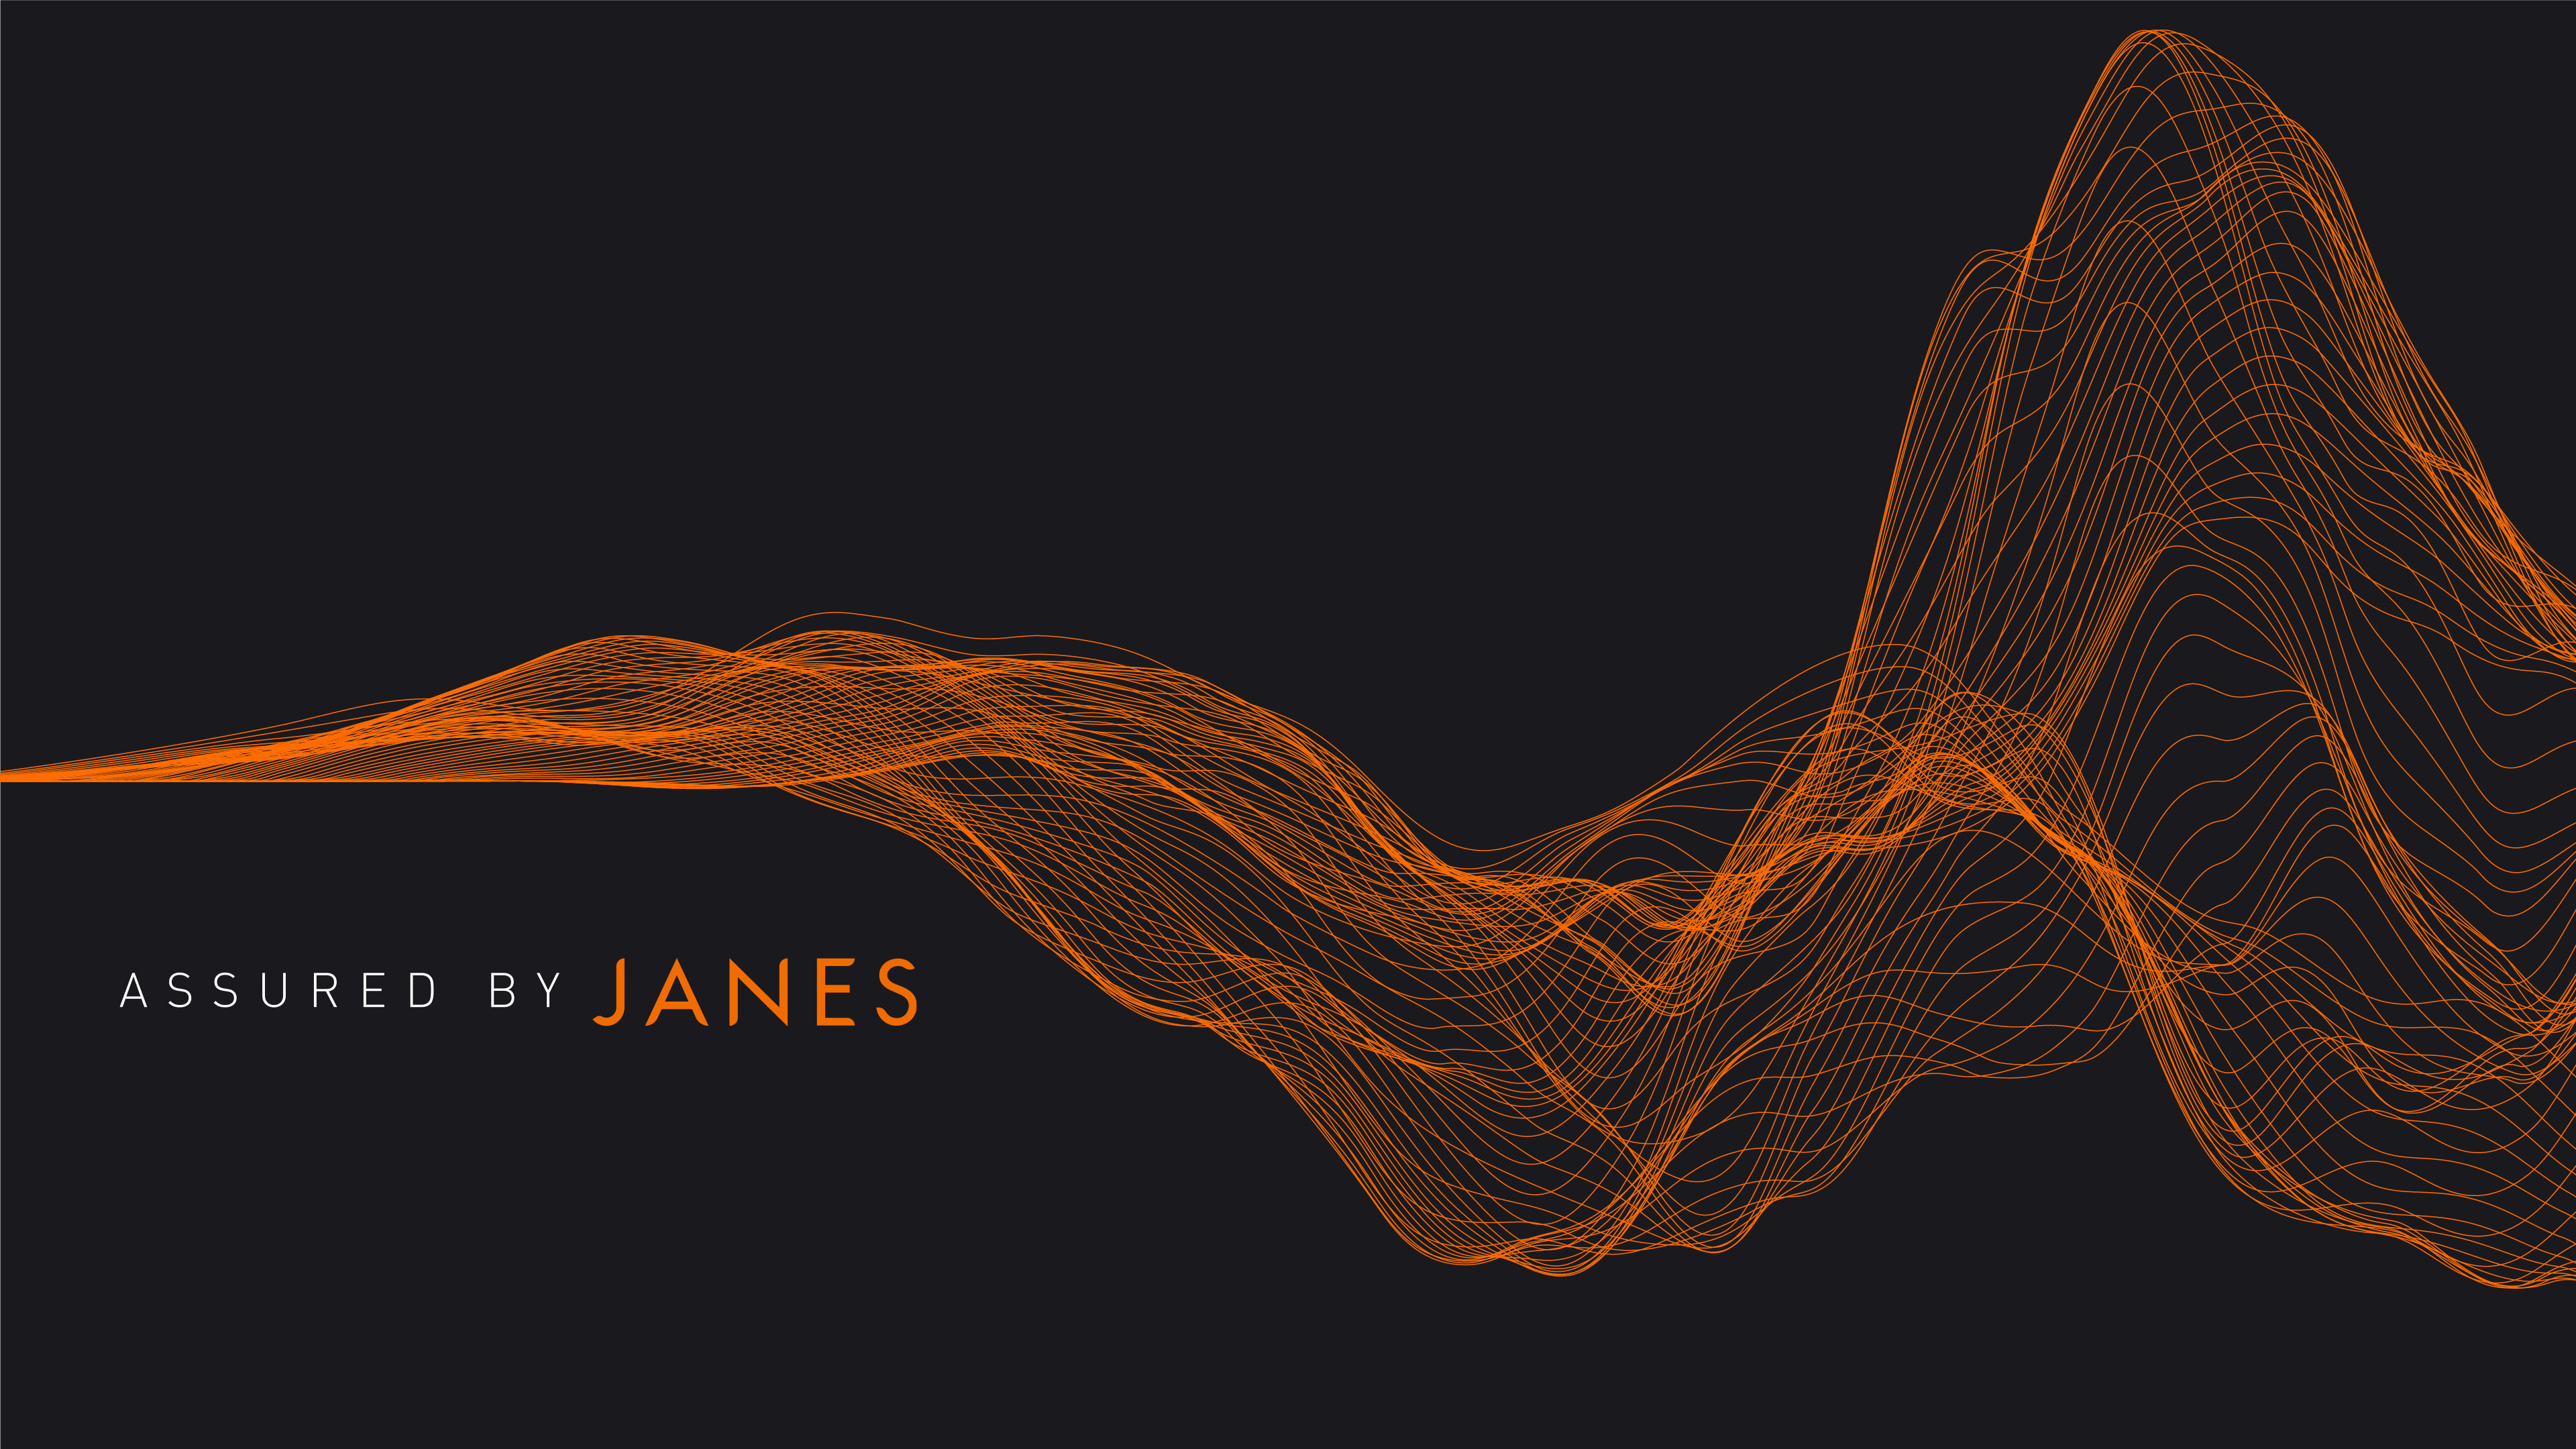 www.janes.com